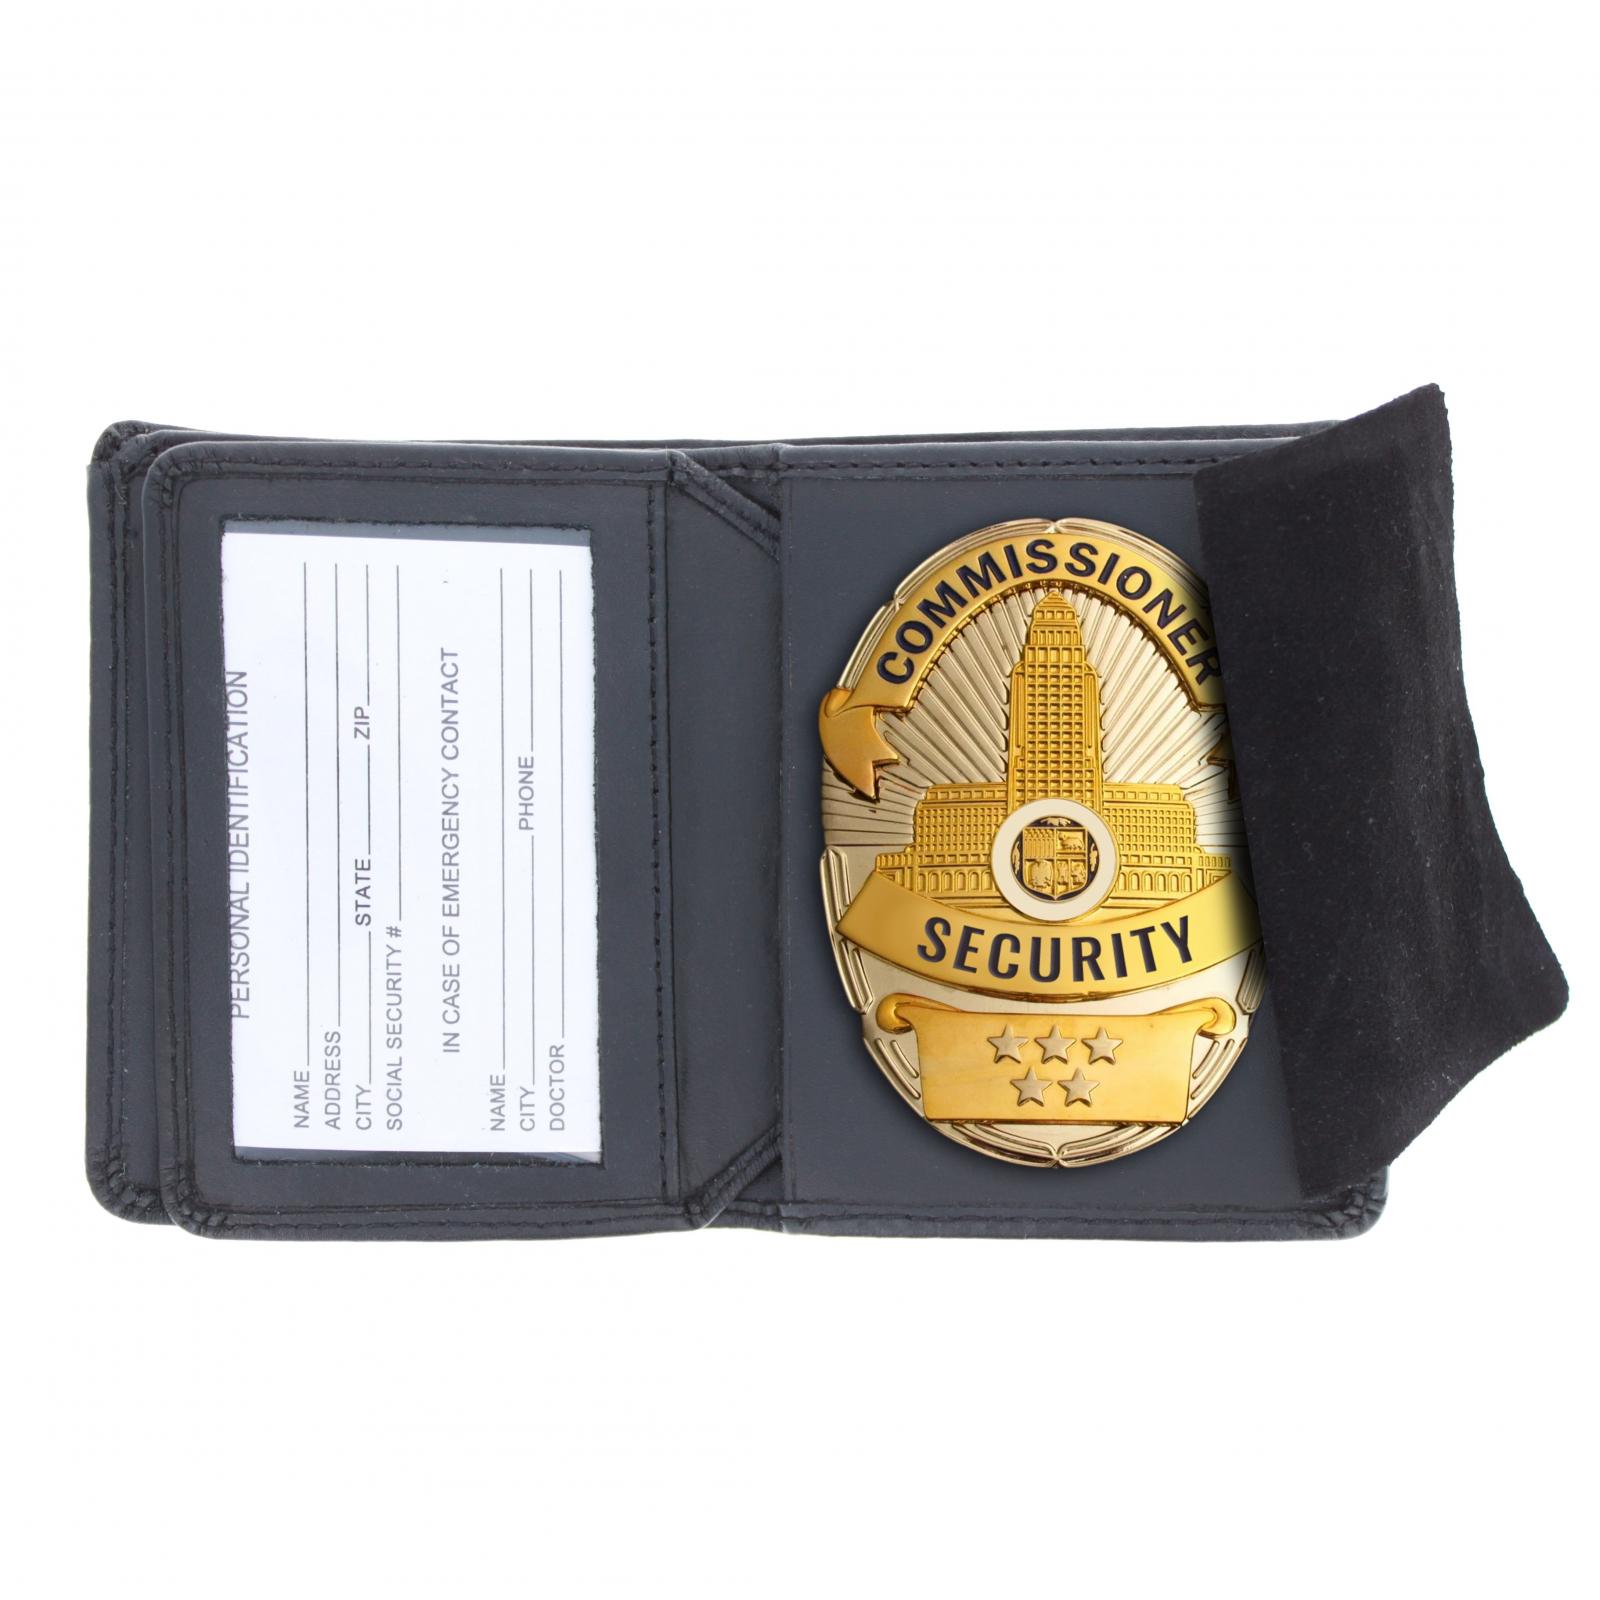 ASR Federal Law Enforcement Leather Hidden Badge Wallet - Oval